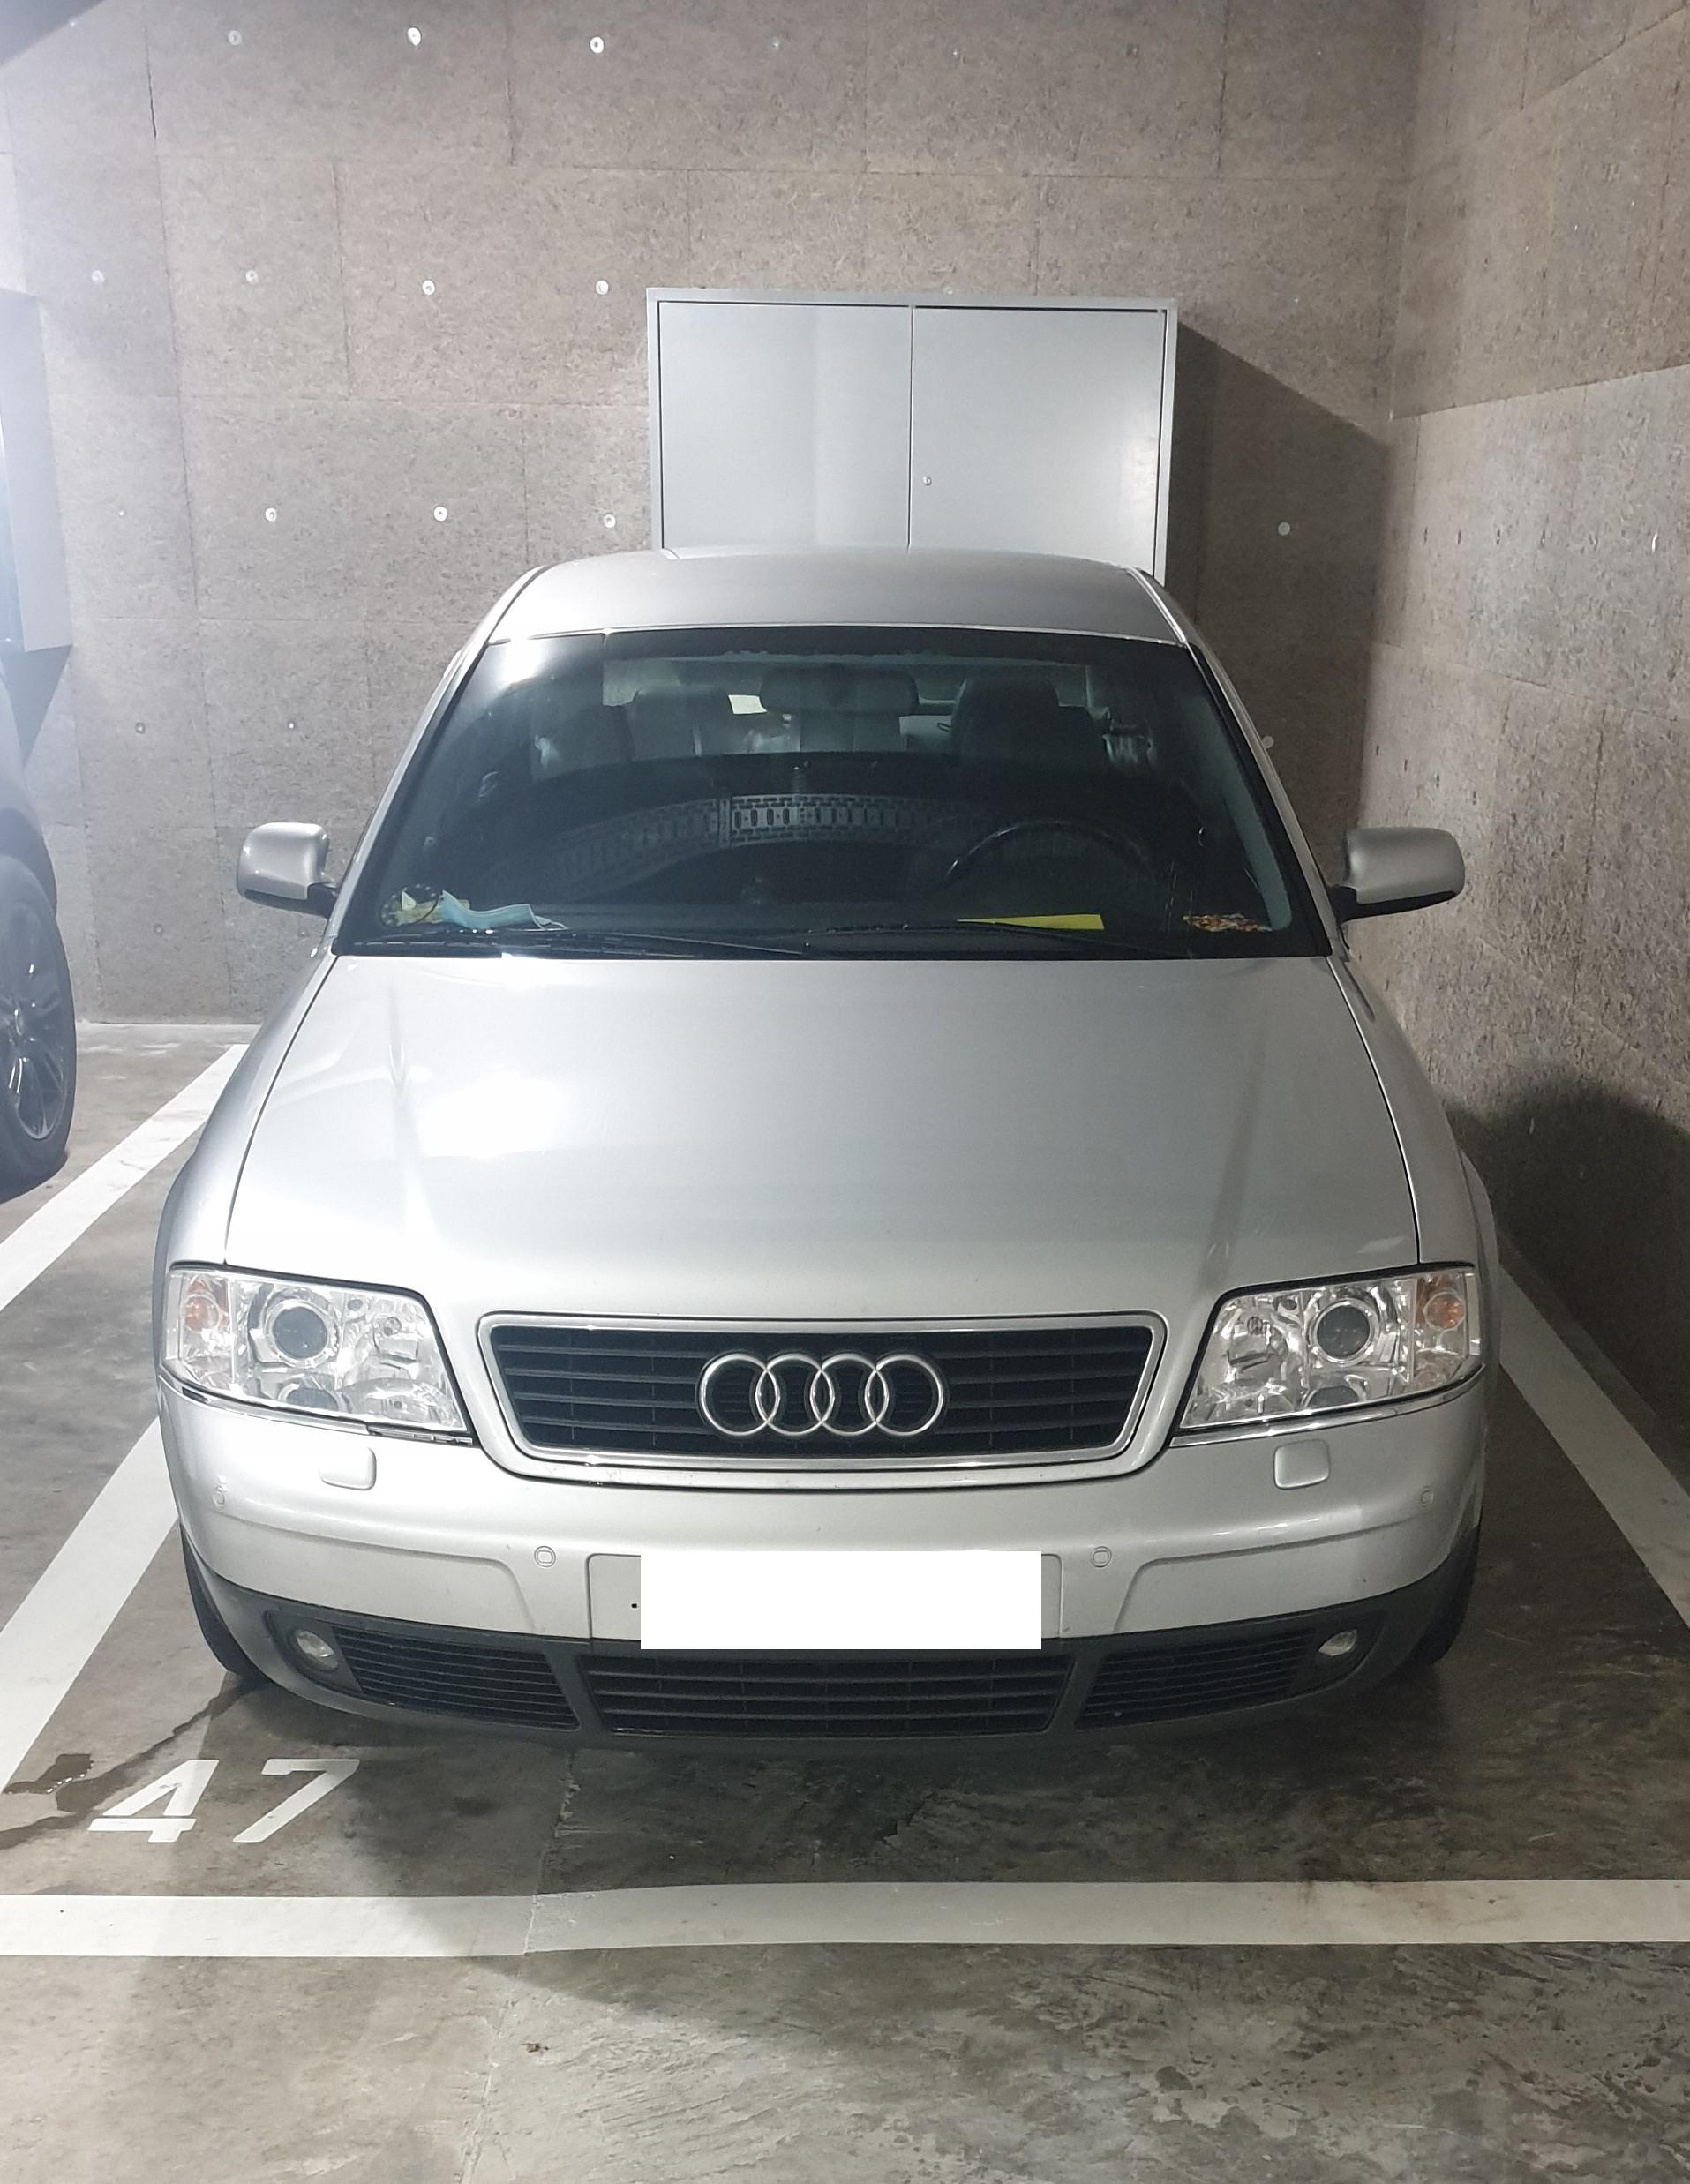 citycar Audi A6 2.8 Advance (Limousine)